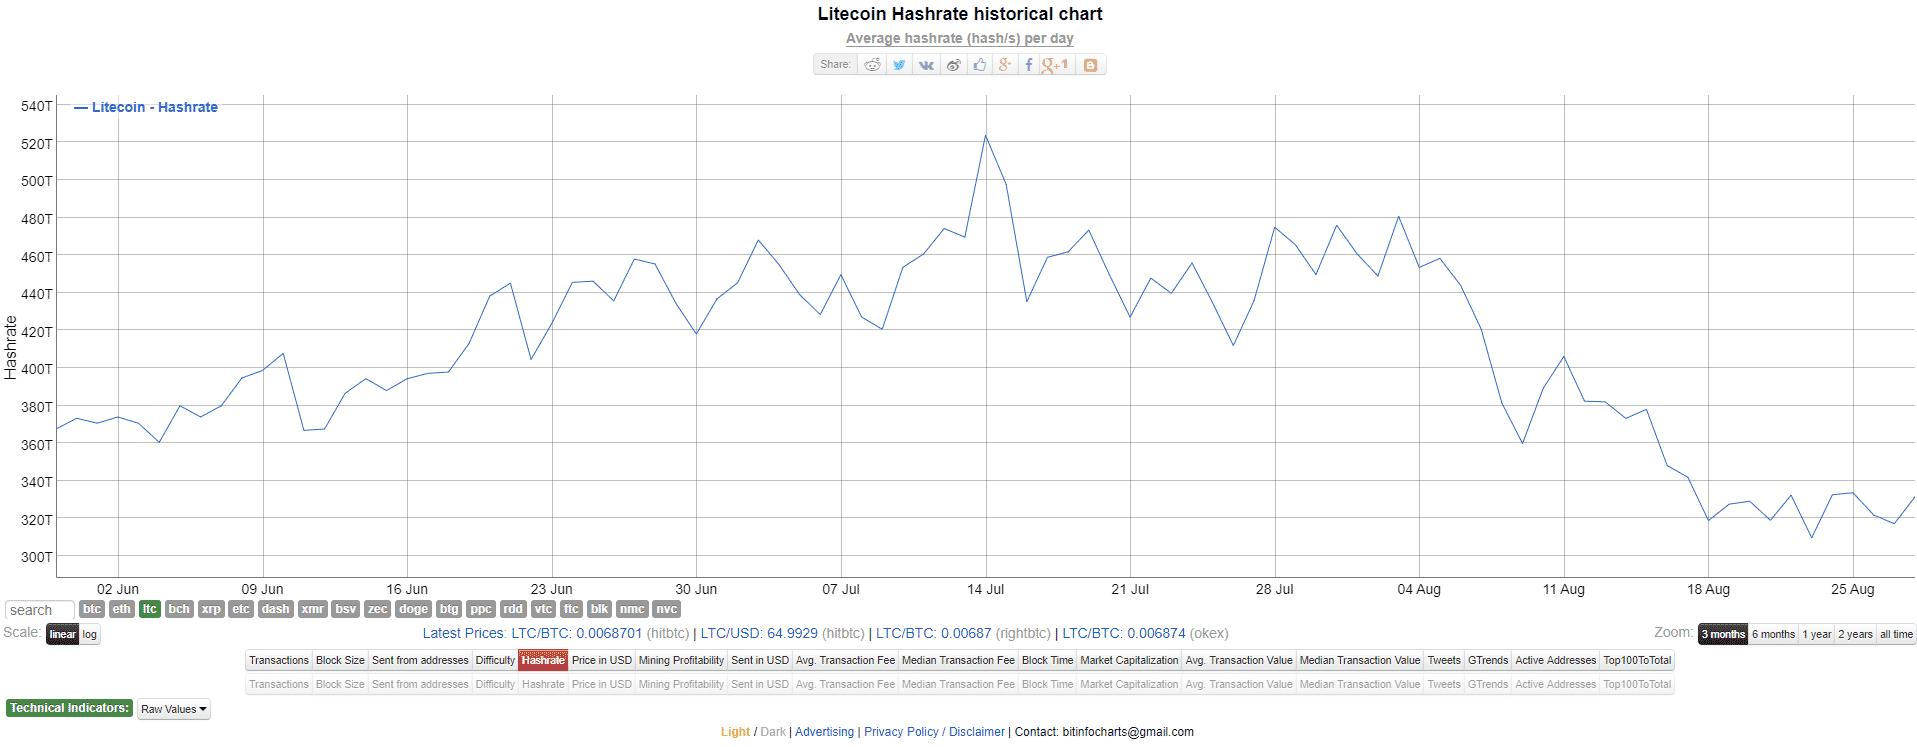 Litecoin Hashrate historical chart